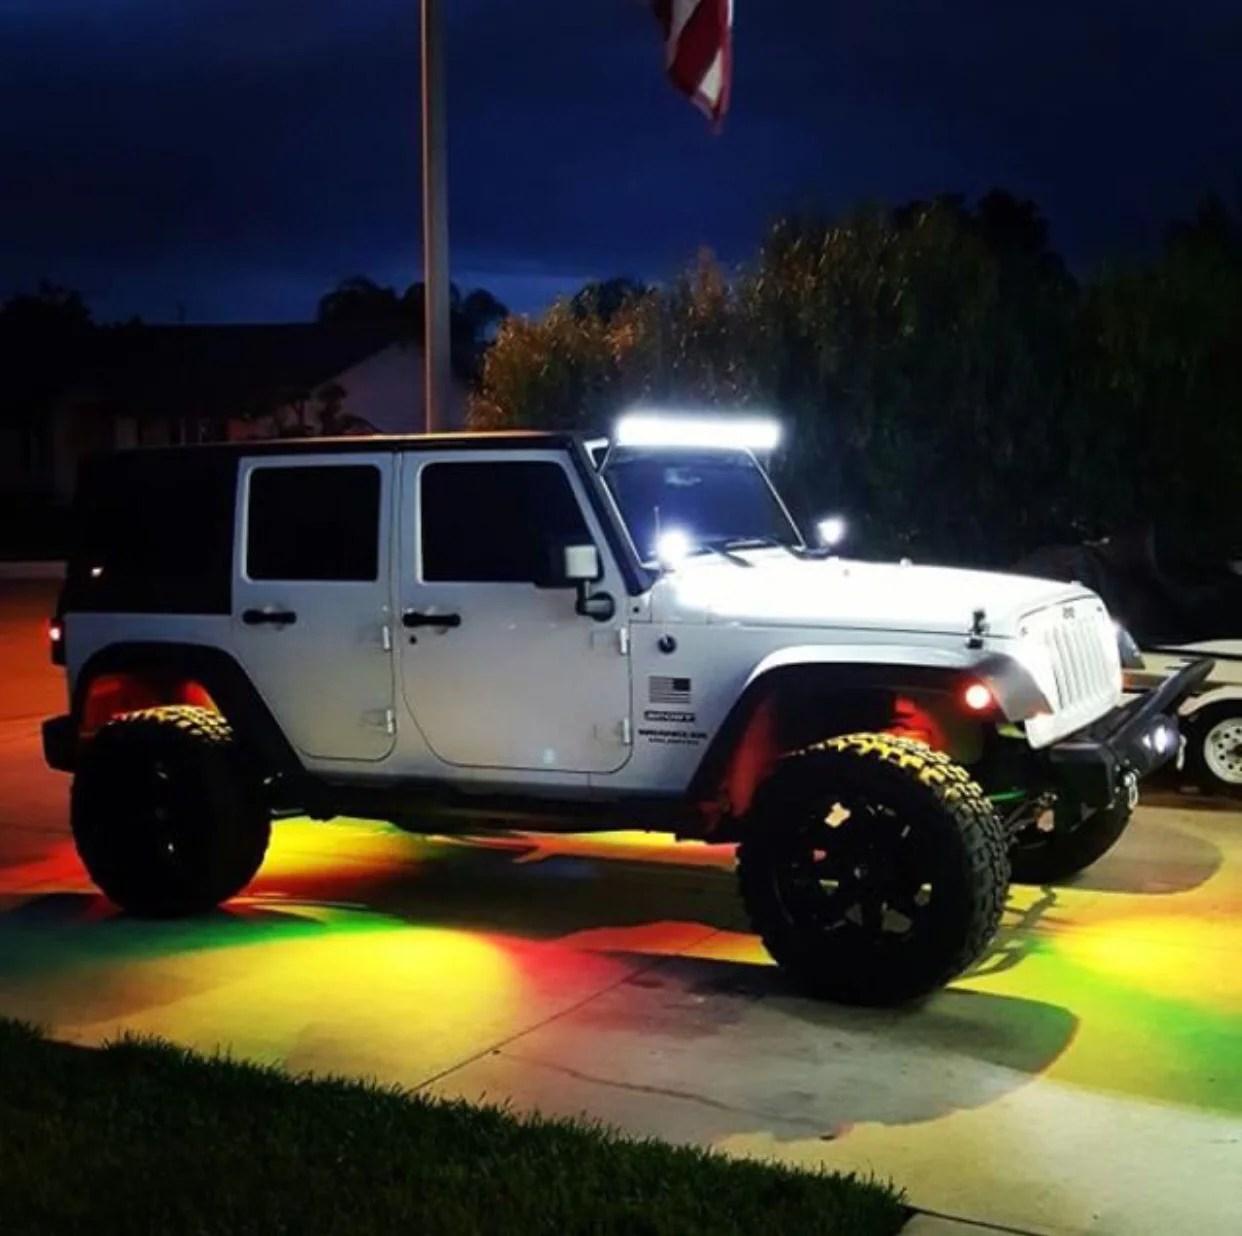 jeep wrangler lightbar combo 52 inch lightbar pods mounts wiring  [ 1242 x 1236 Pixel ]